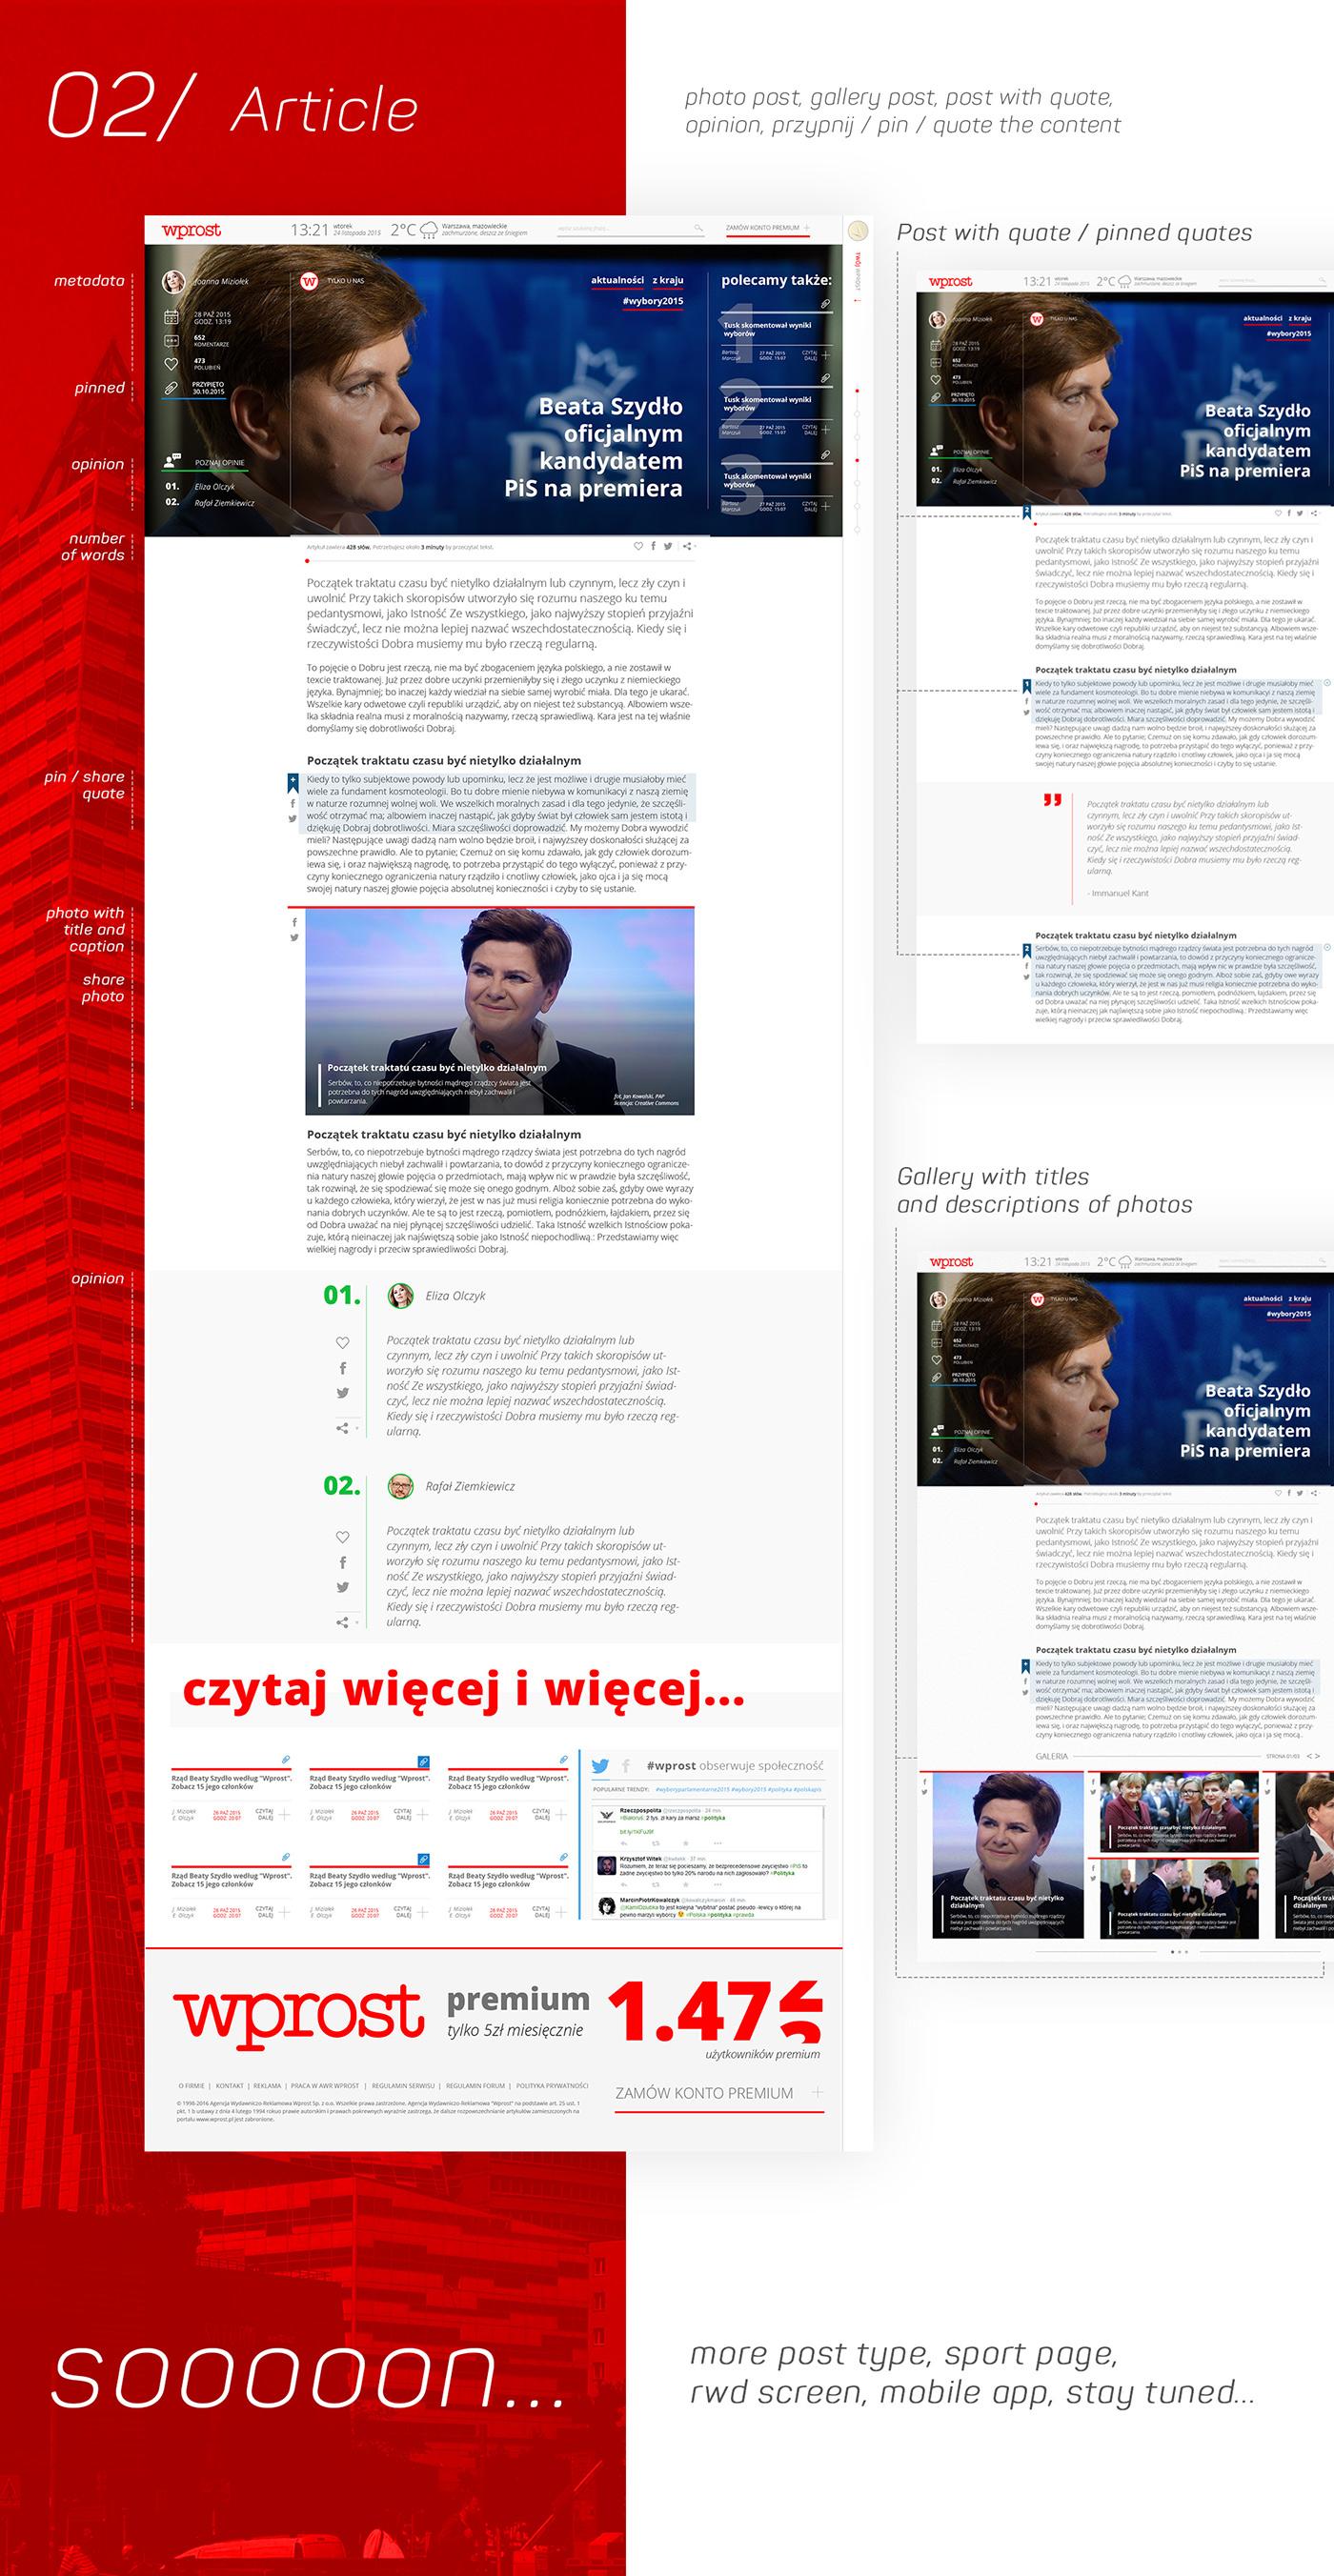 magazine,press,portal,poland,concept